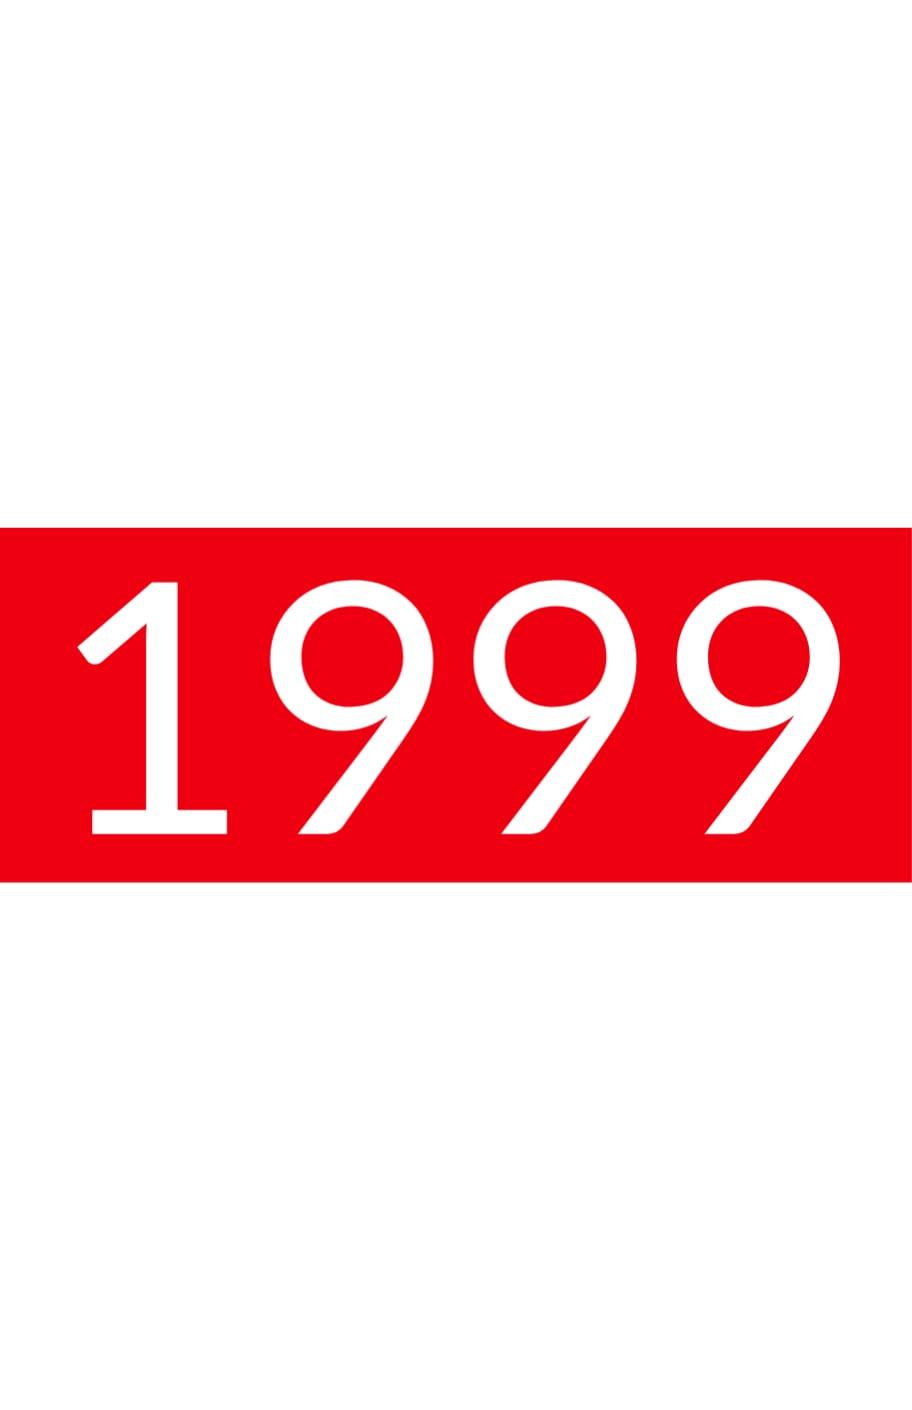 Orange background with white text: 1999